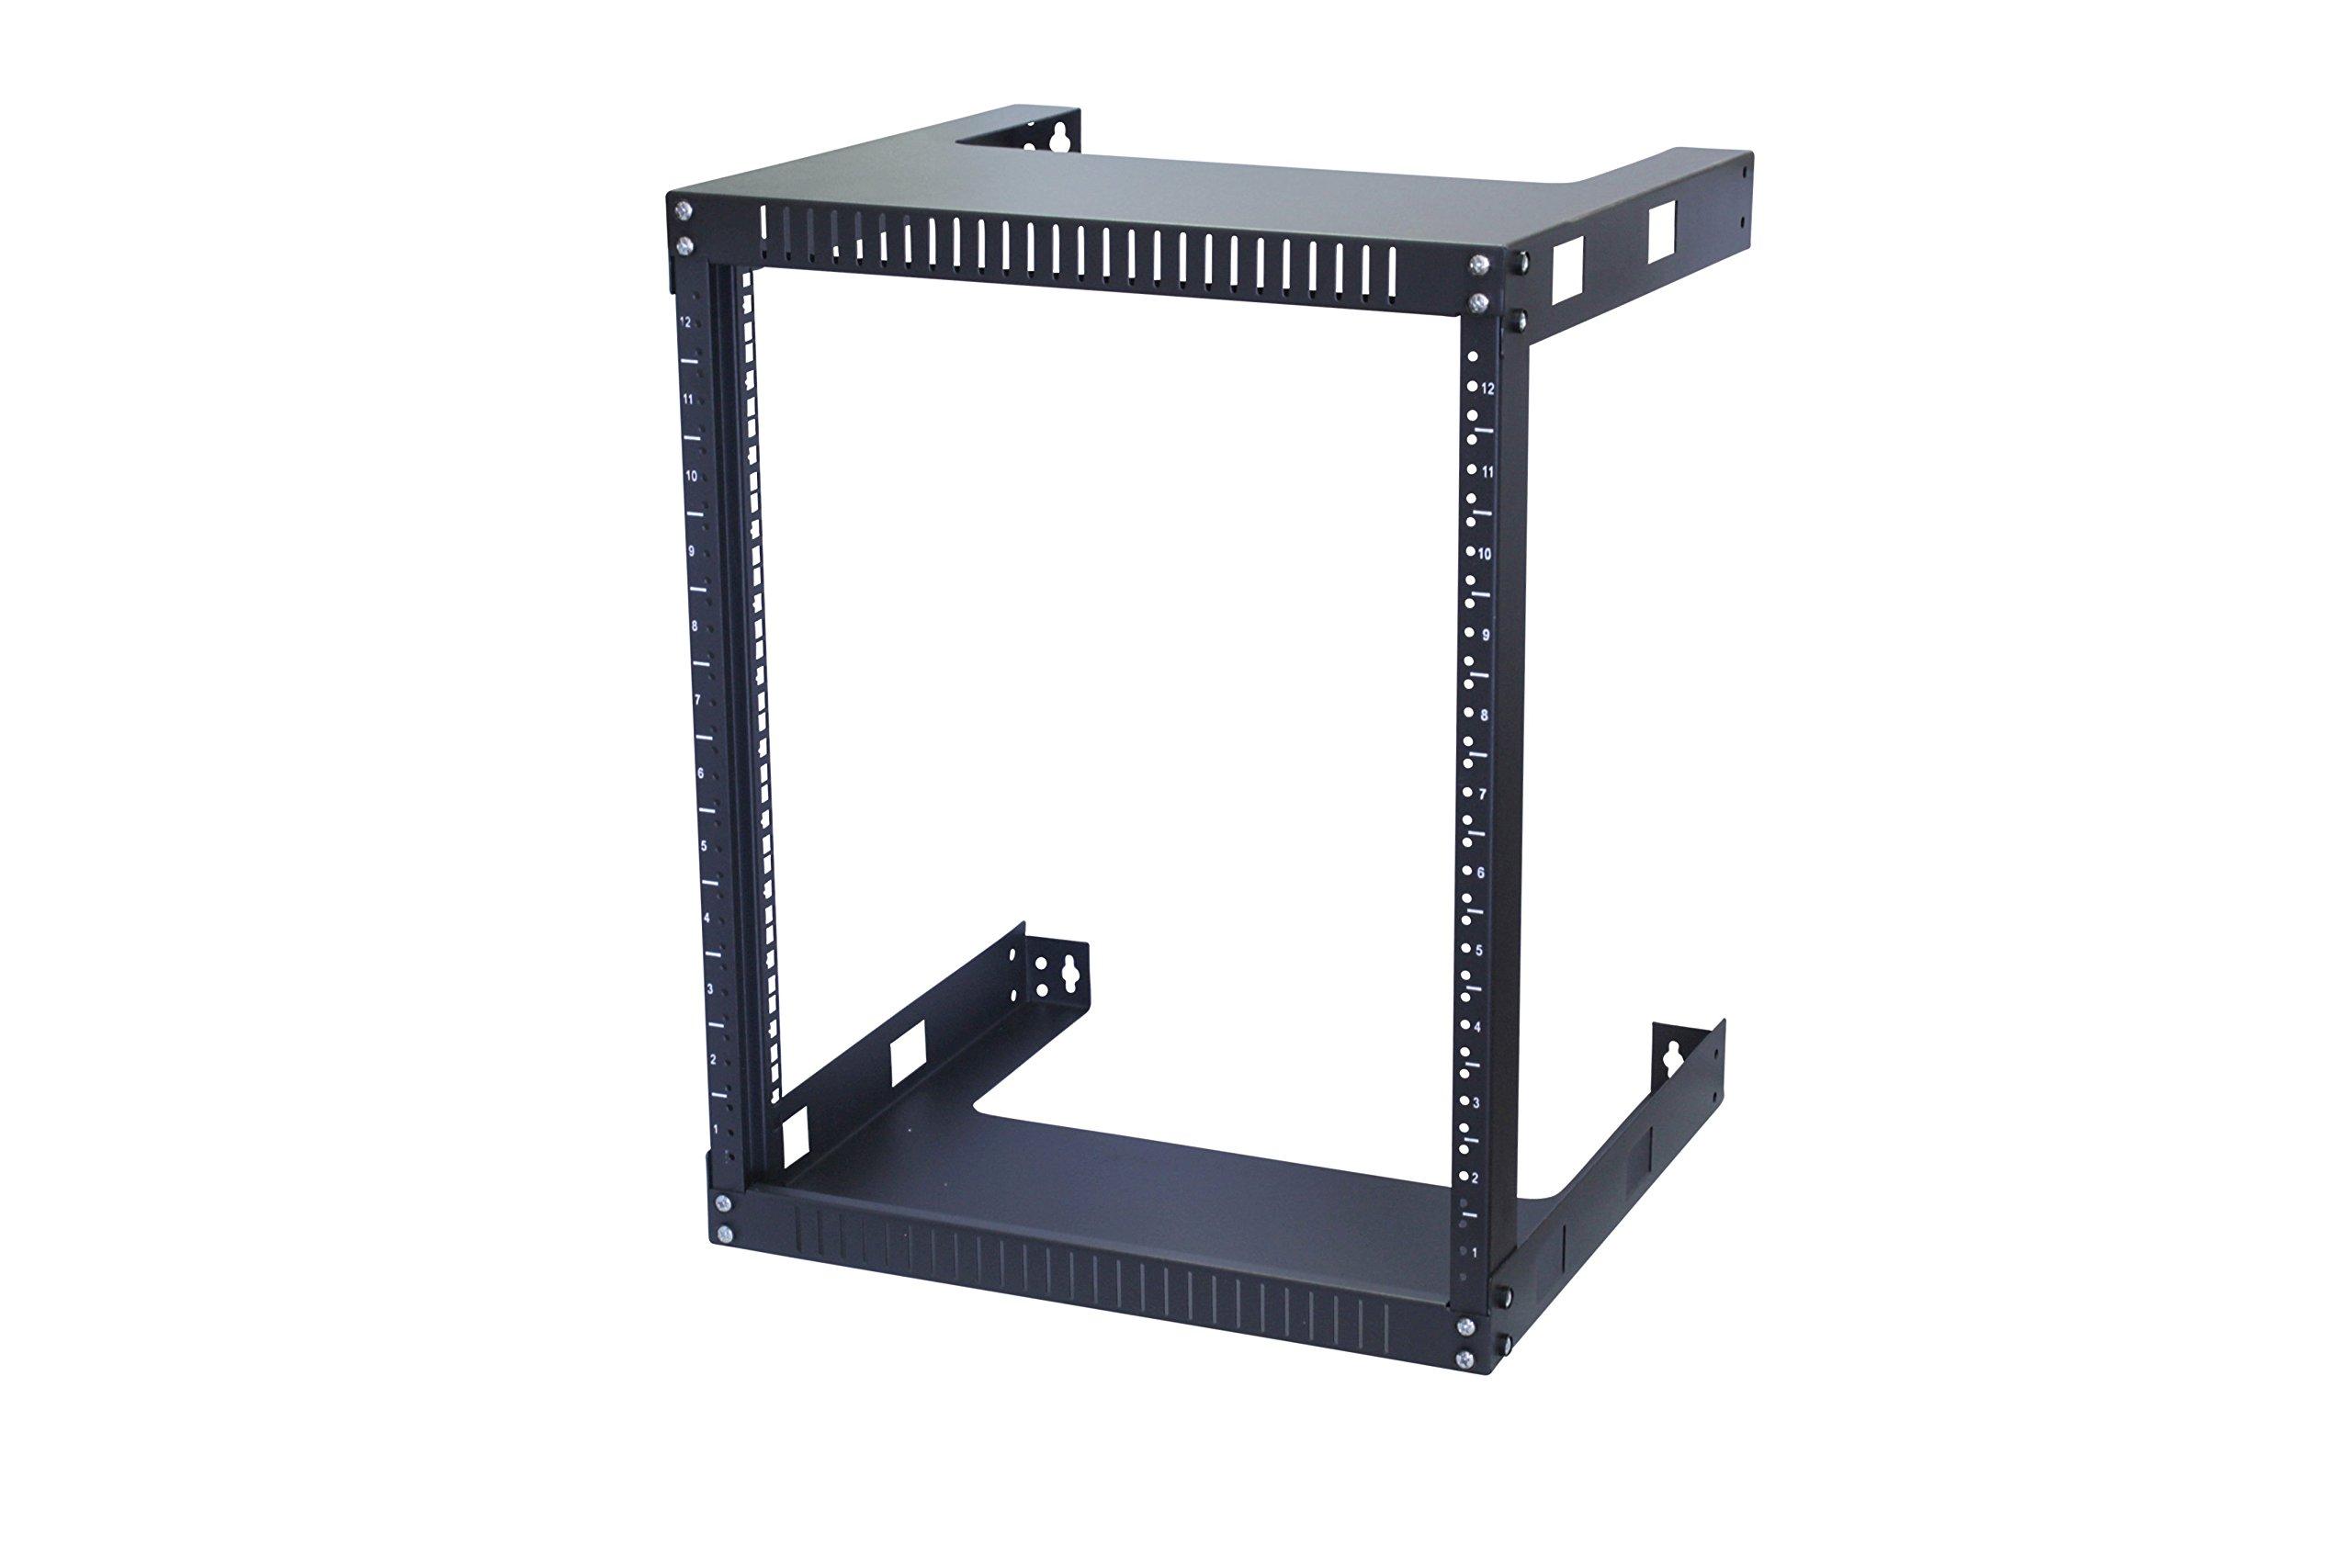 KENUCO 12U Wall Mount Open Frame Steel Network Equipment Rack 17.75 Inch Deep by KENUCO